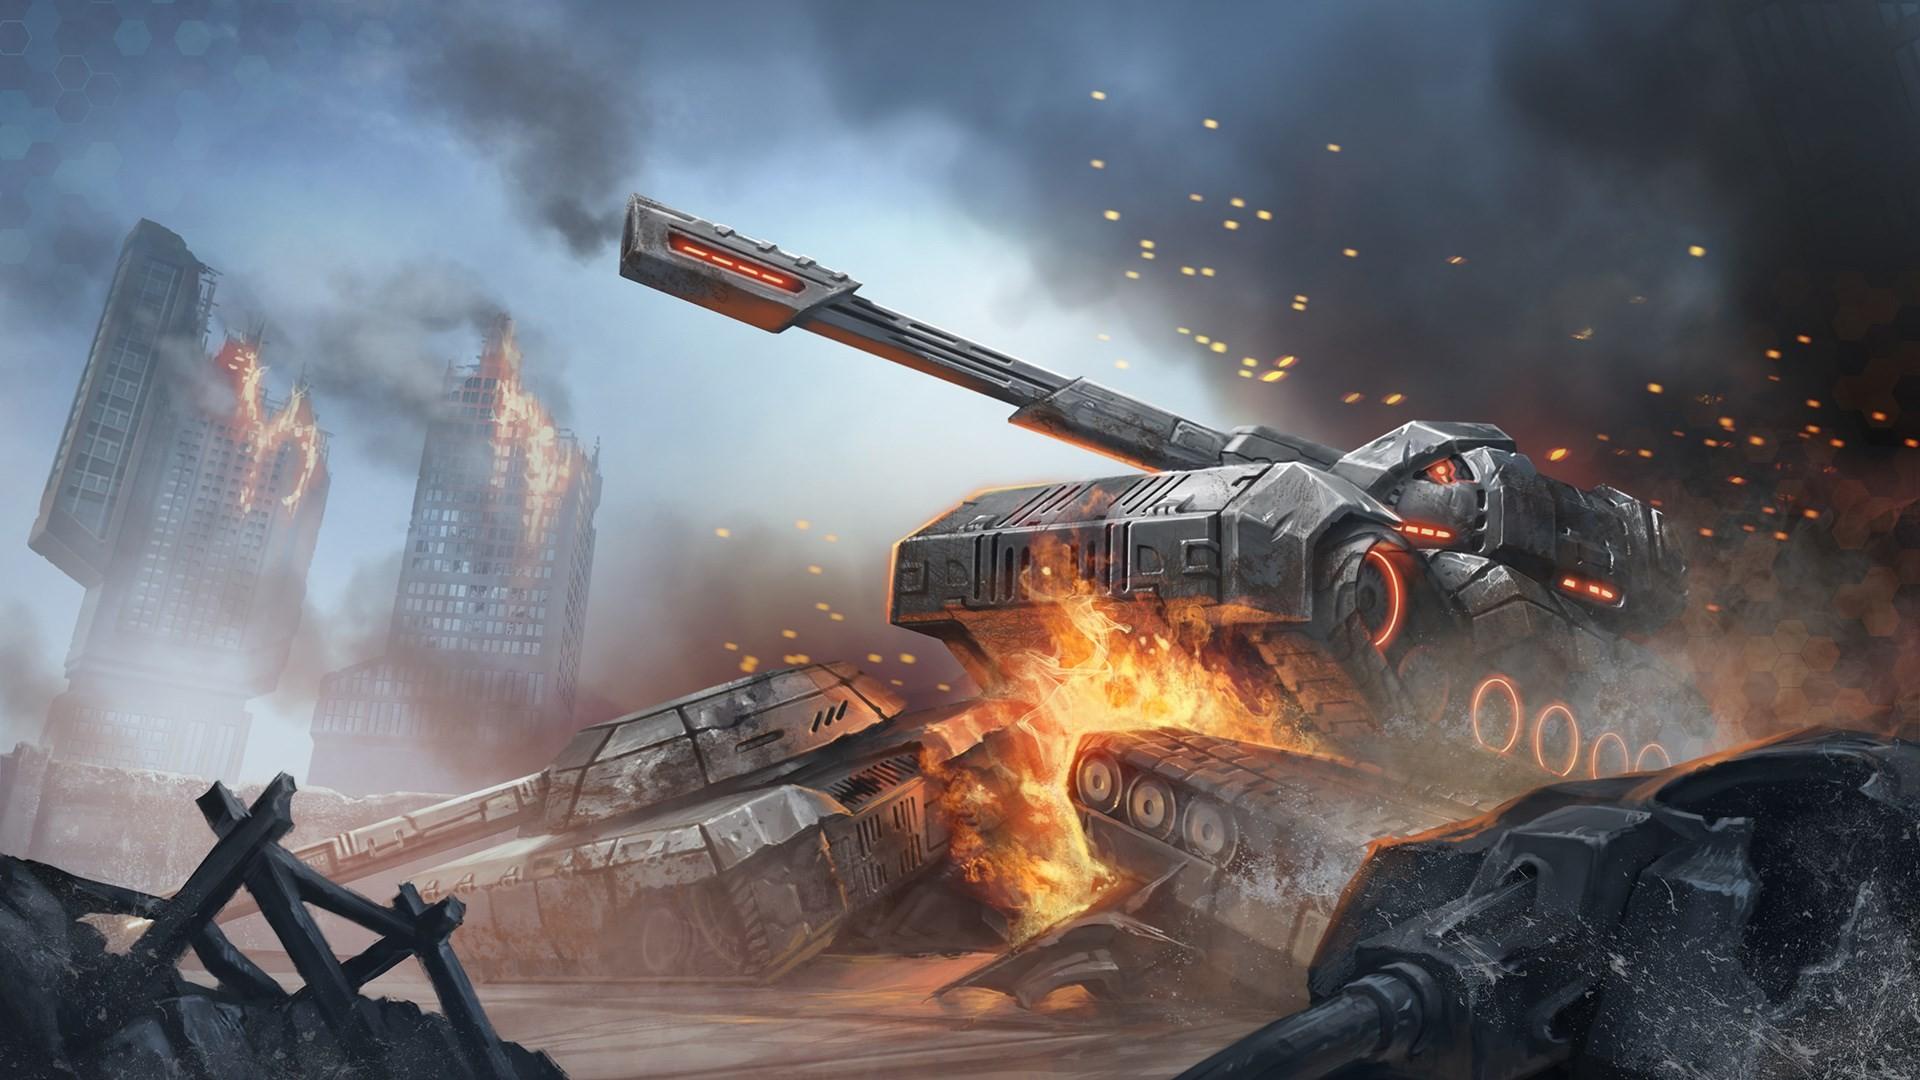 Calendario Liga Portugal 2019 Más Actual Get Iron Tanks Battle Online Microsoft Store